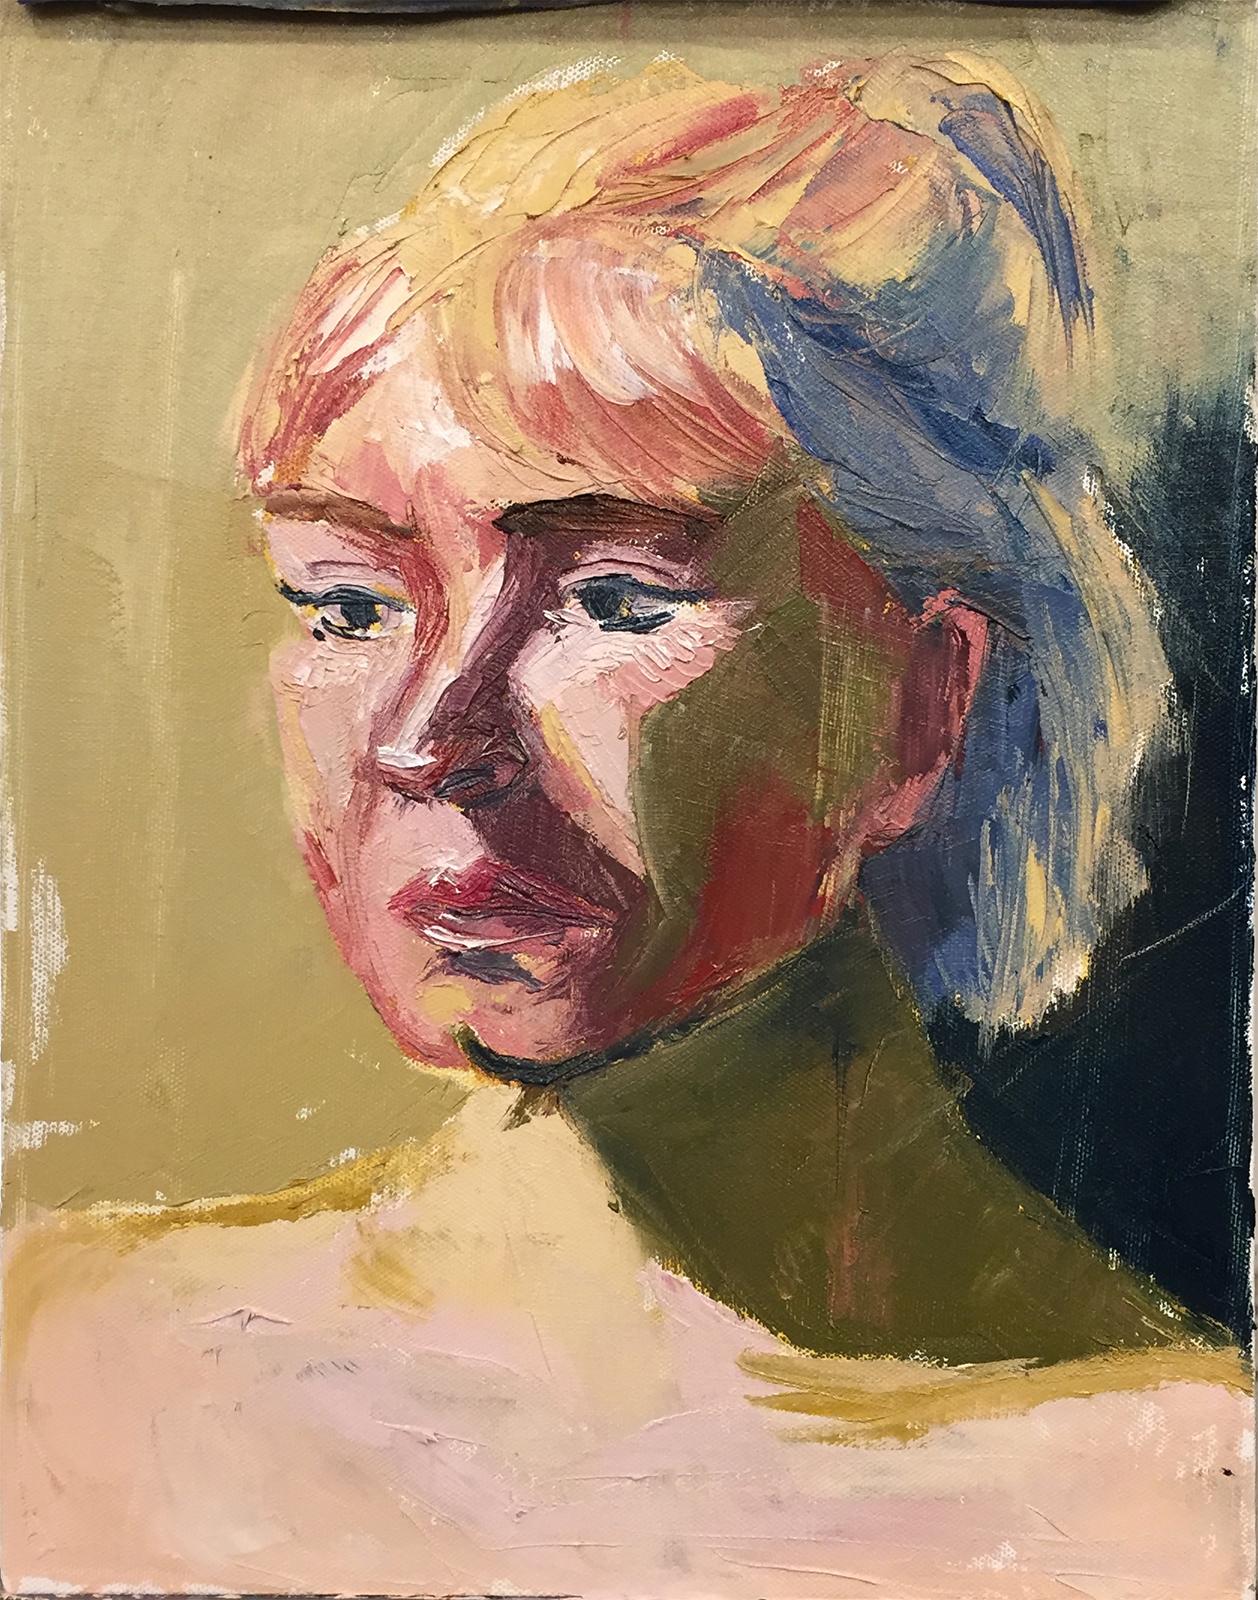 Yelena  oil on canvas  11x14